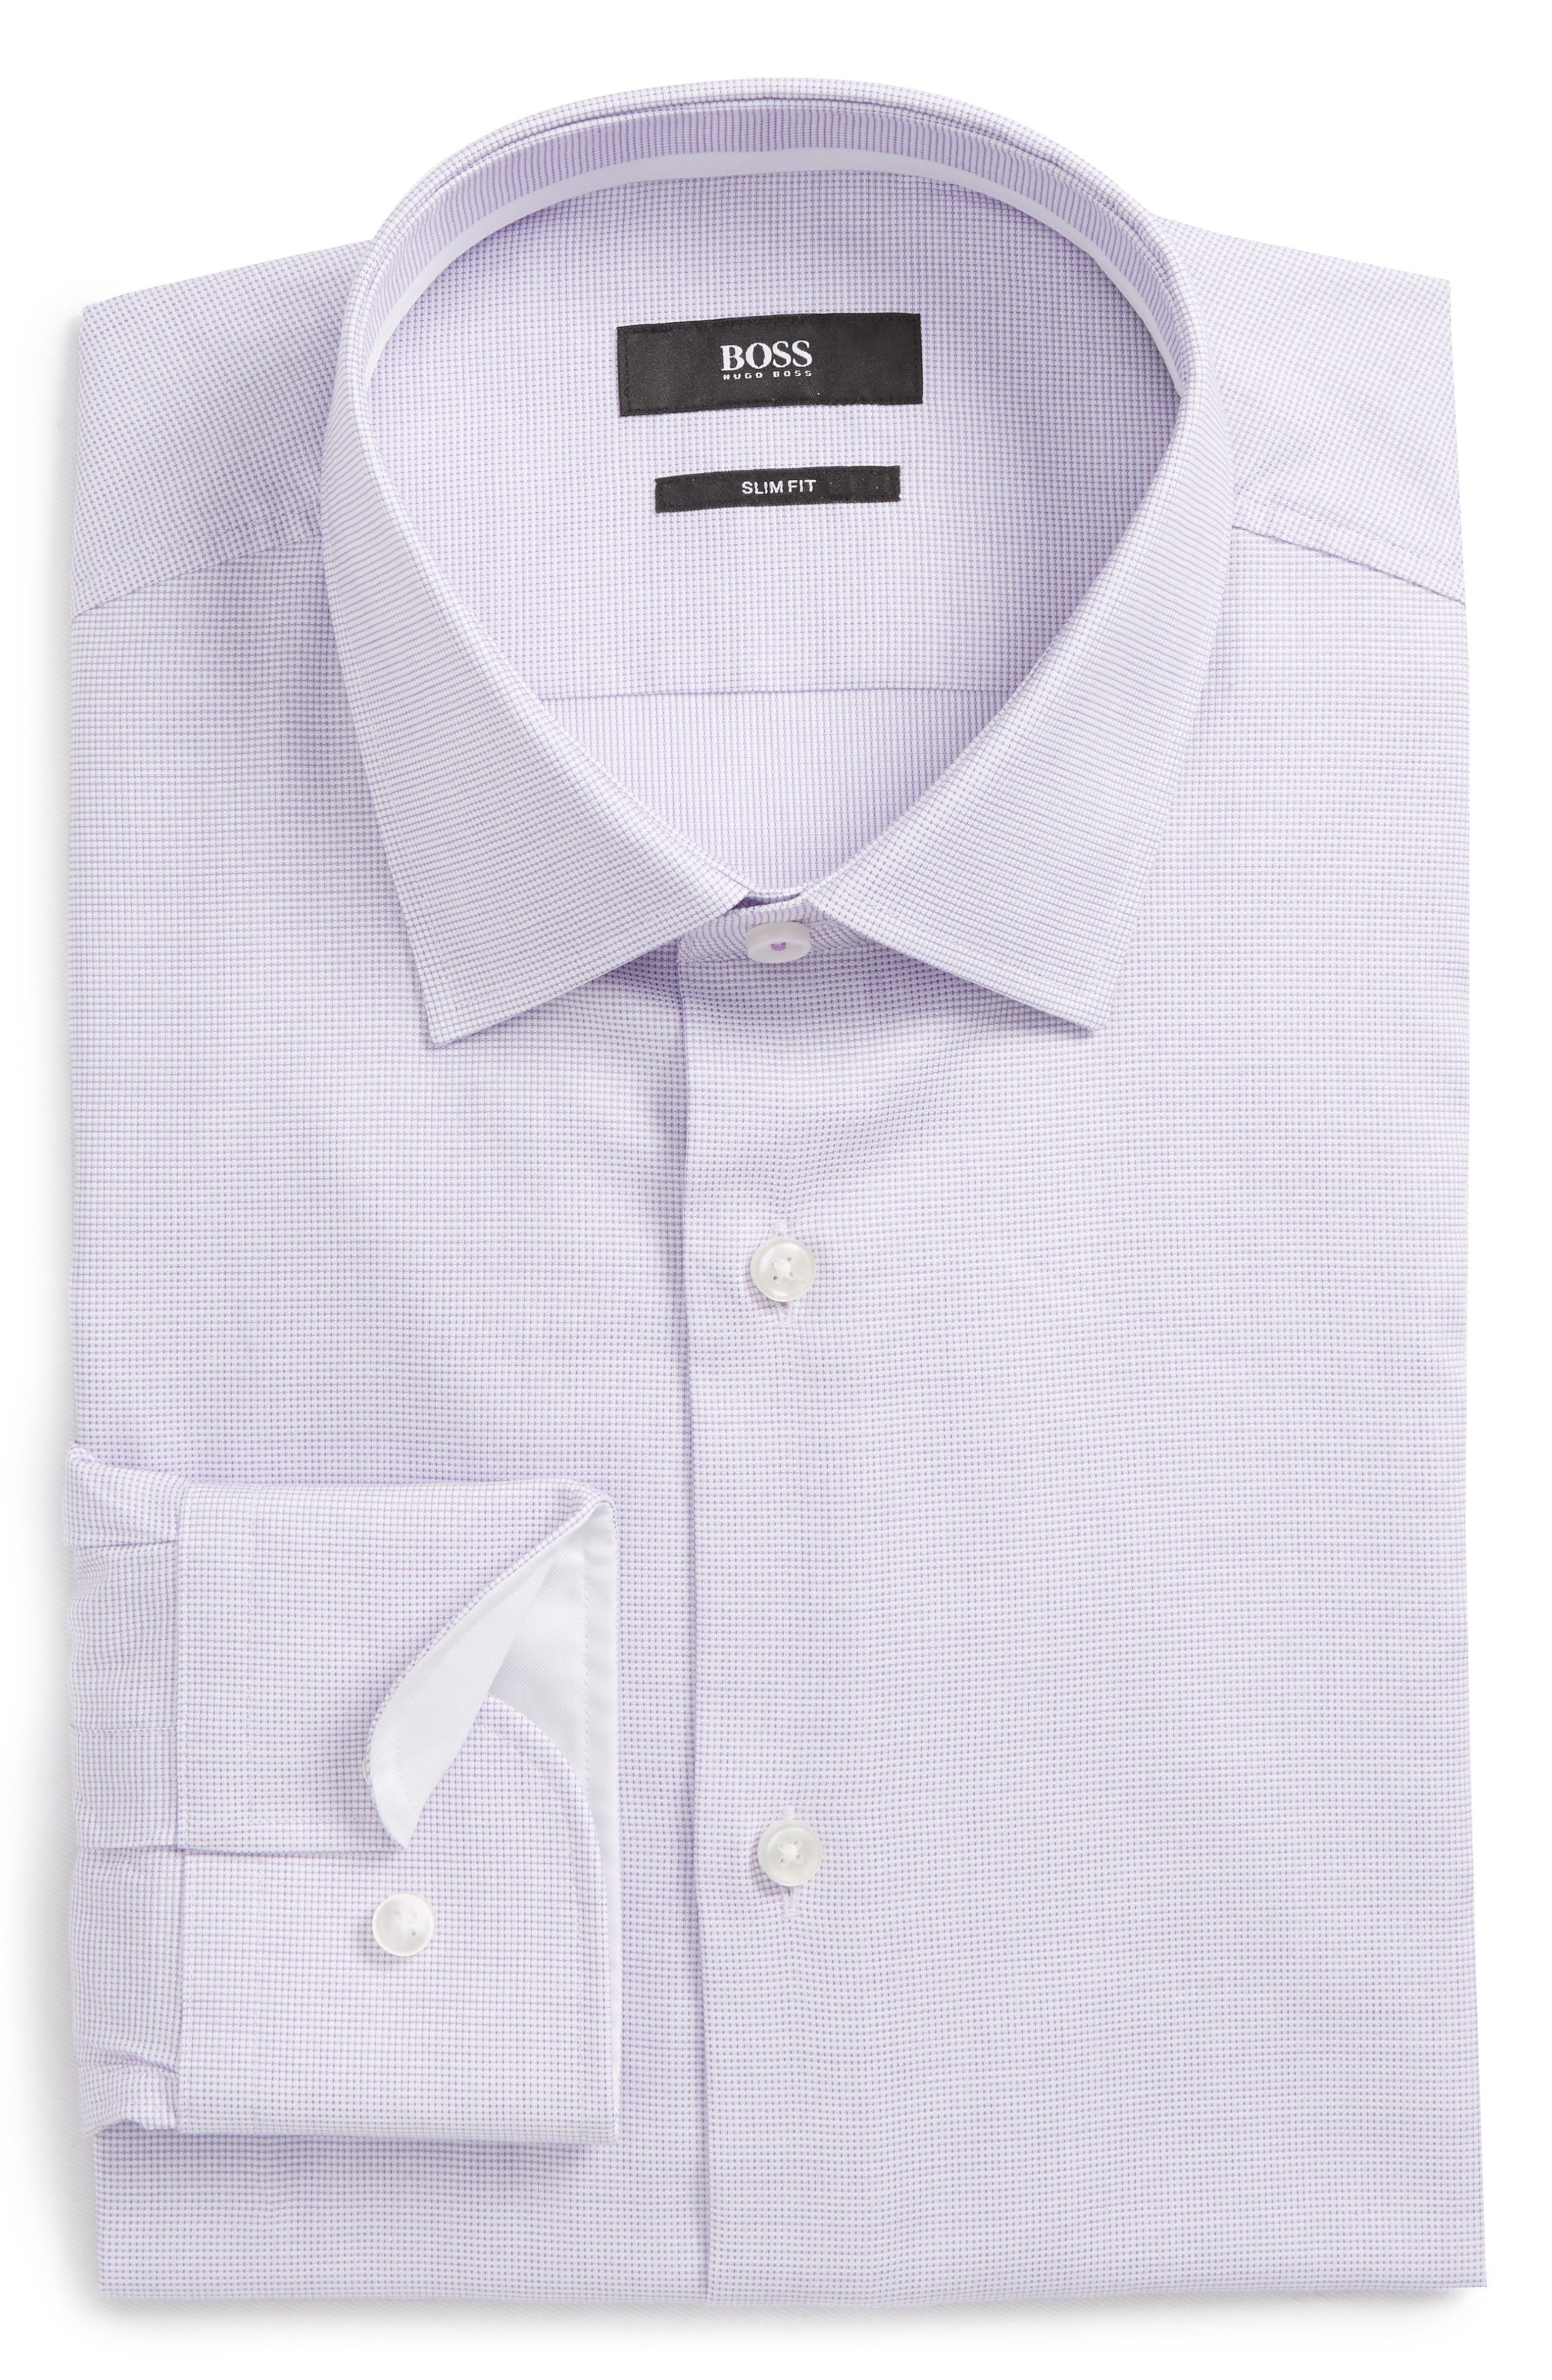 Jesse Slim Fit Dress Shirt,                             Alternate thumbnail 6, color,                             Purple